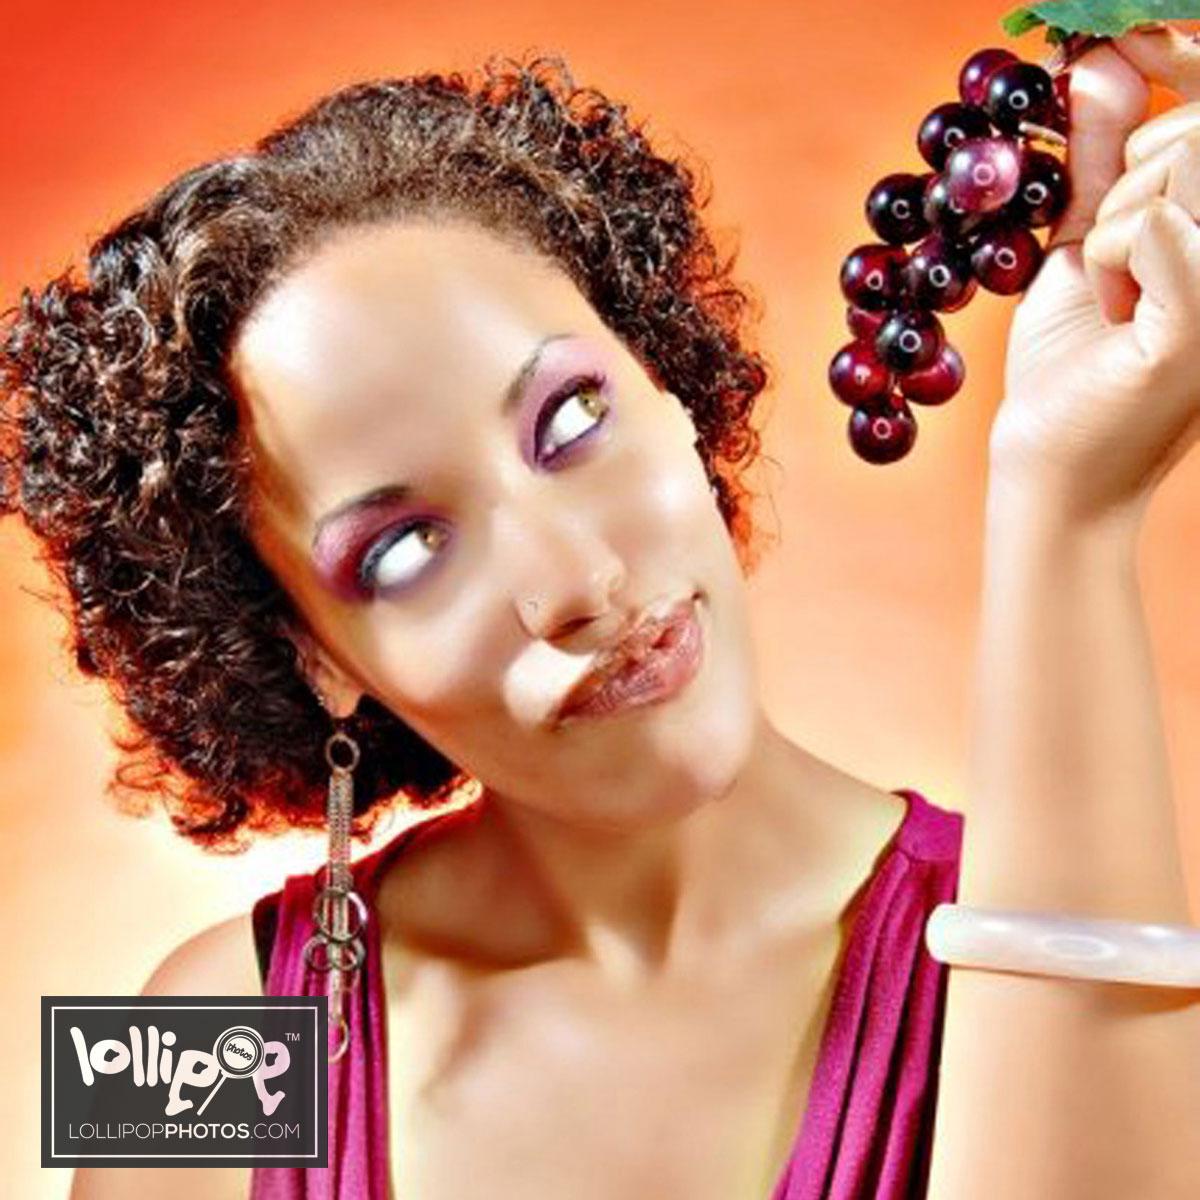 msdig-nora-canfield-lollipop-photos-129.jpg